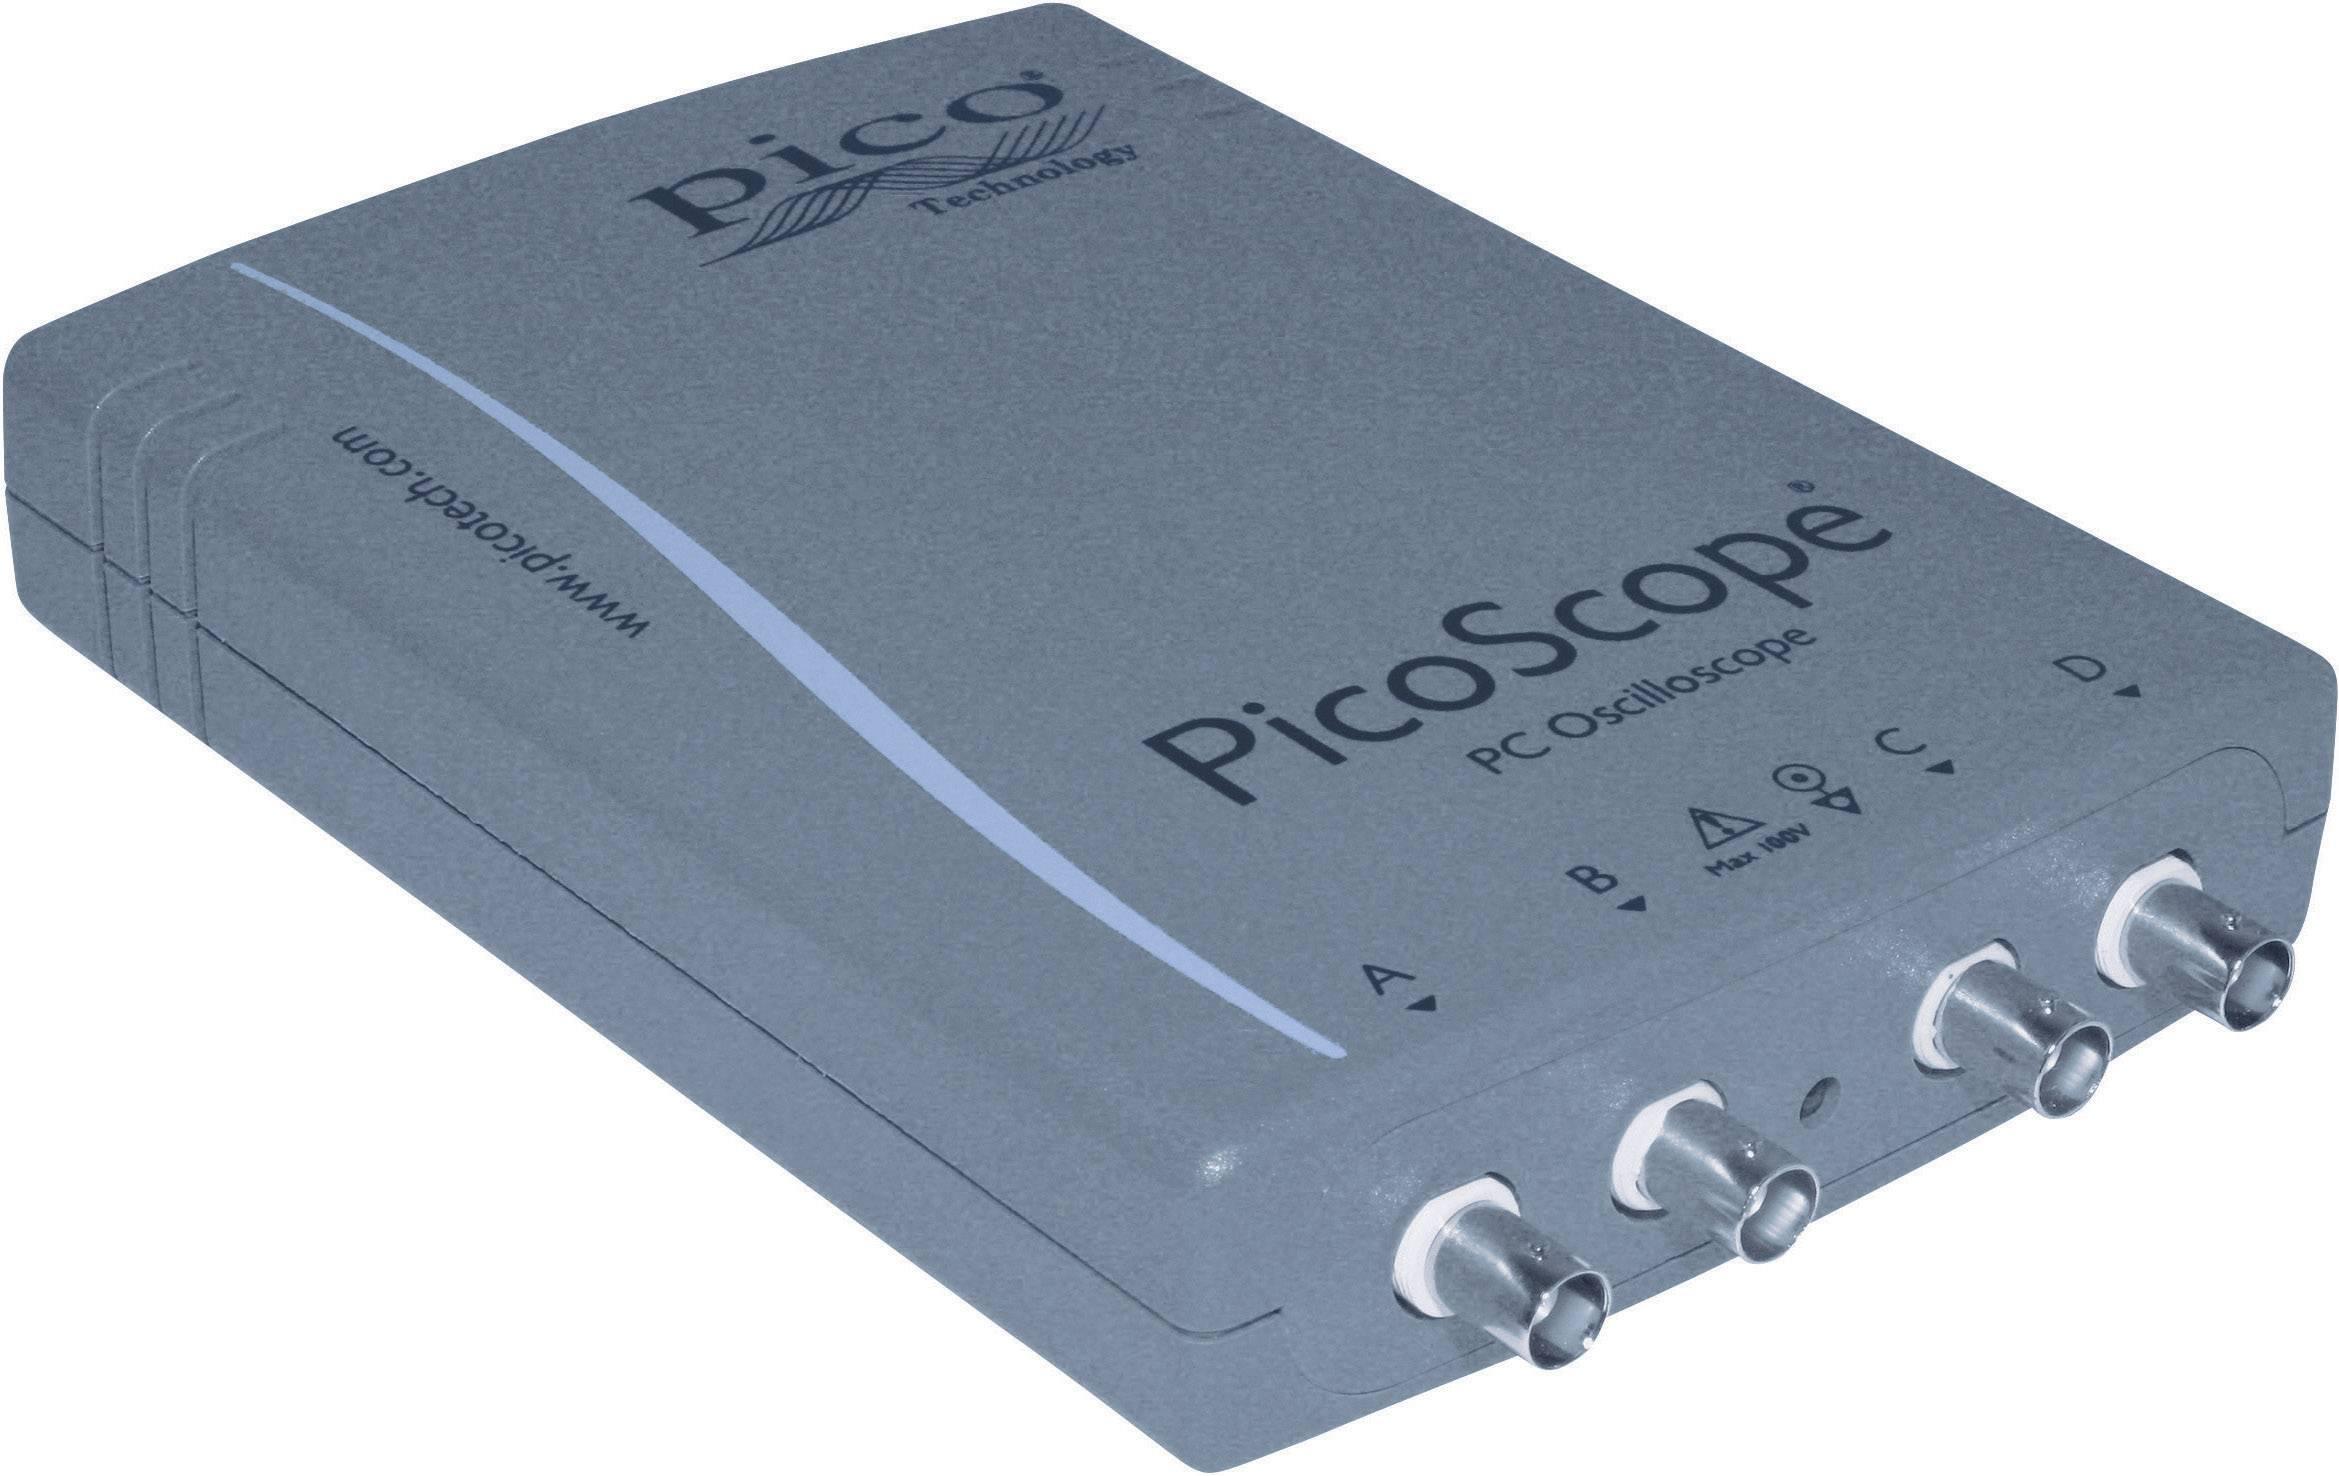 USB osciloskop pico PP479, 20 MHz, 4kanálová